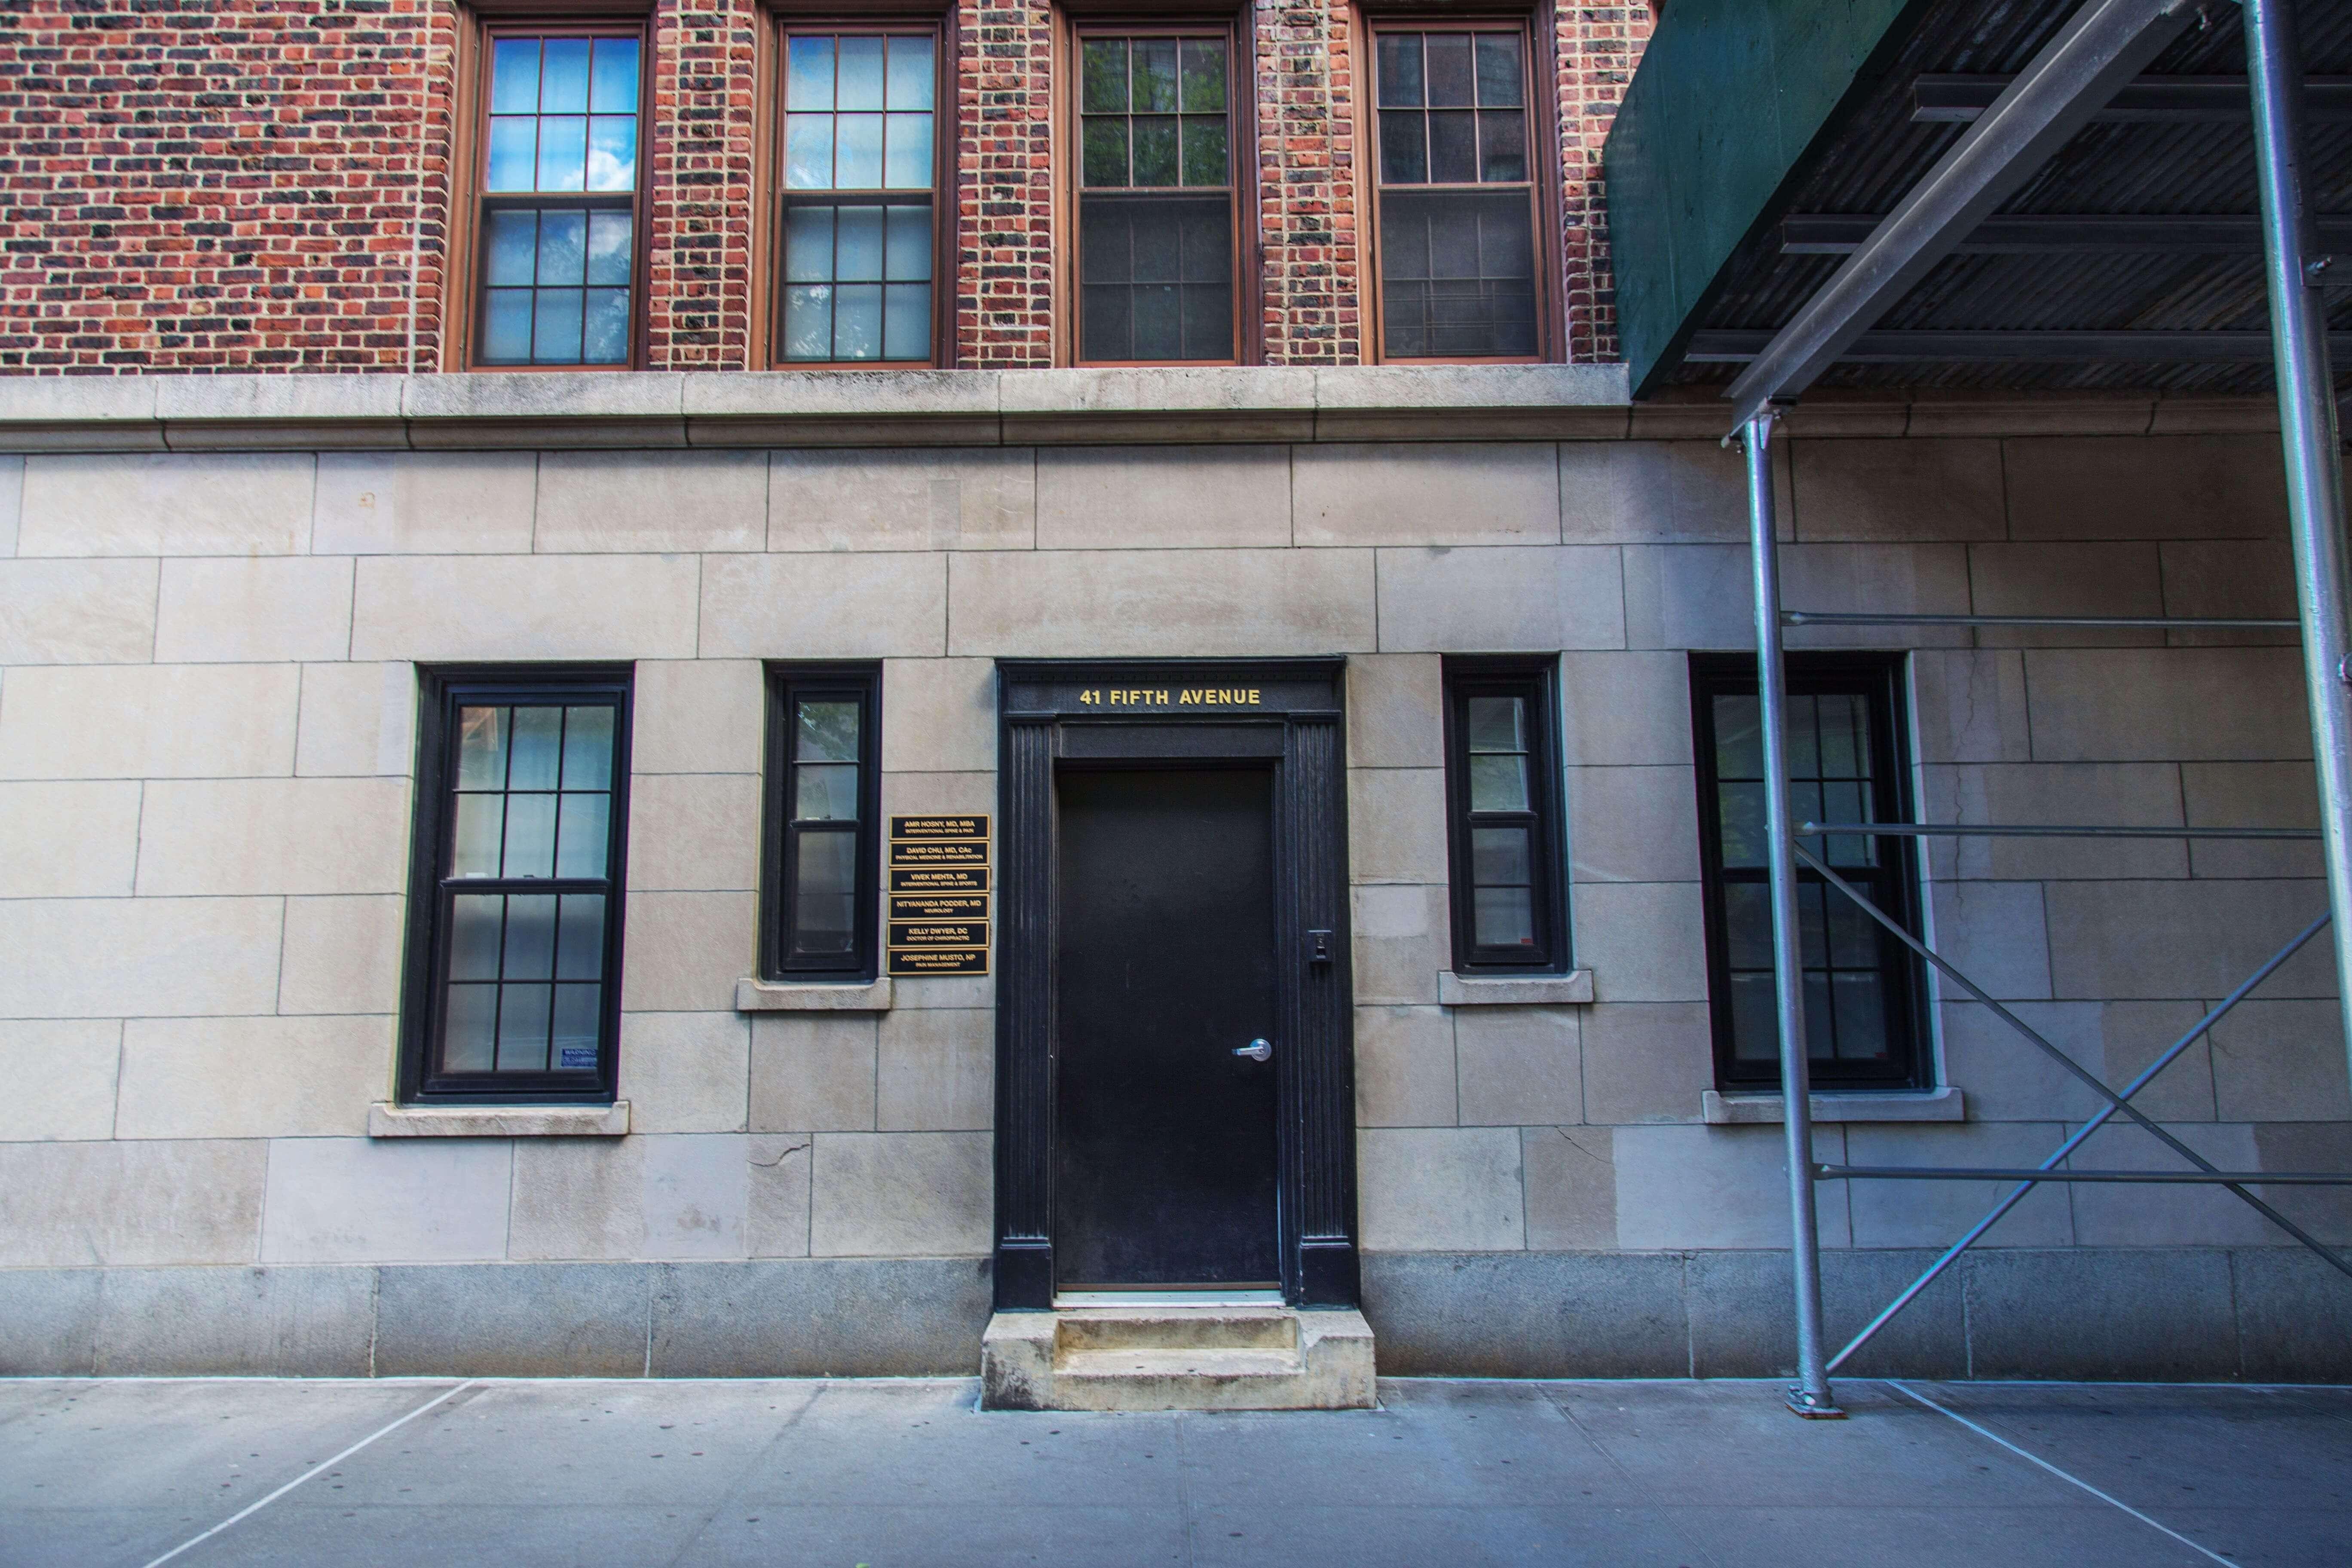 41-Fifth-Avenue.jpg